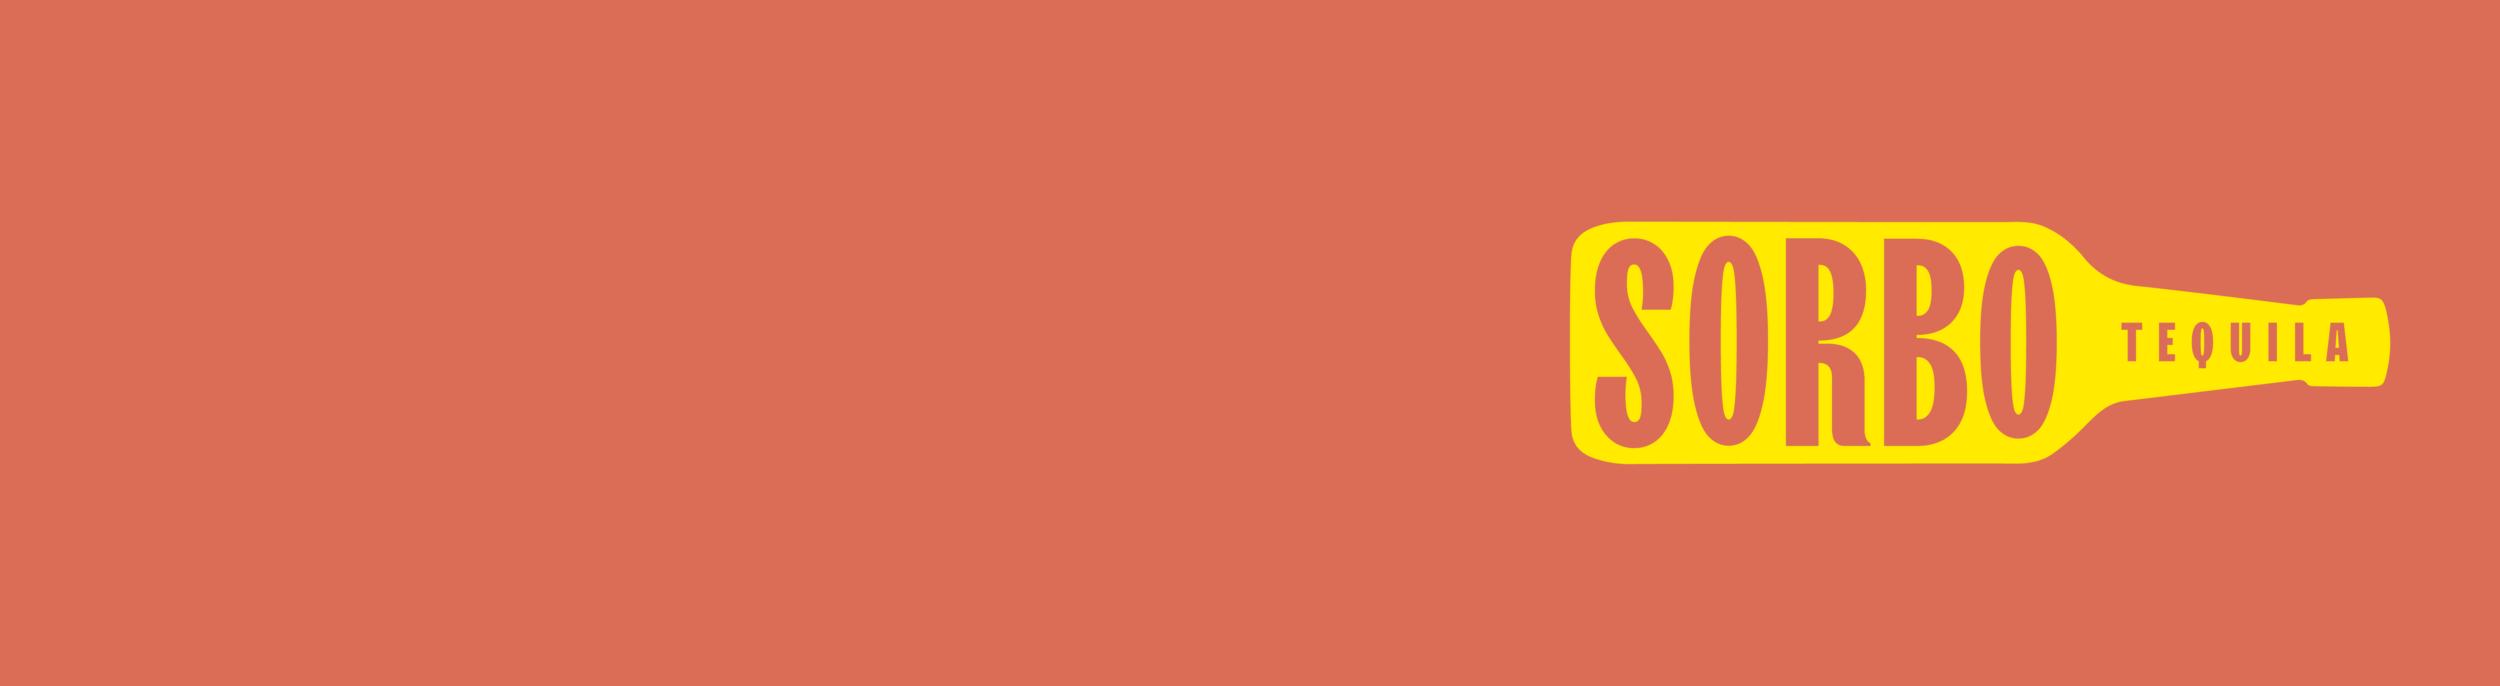 Sorbo Tequila Logo